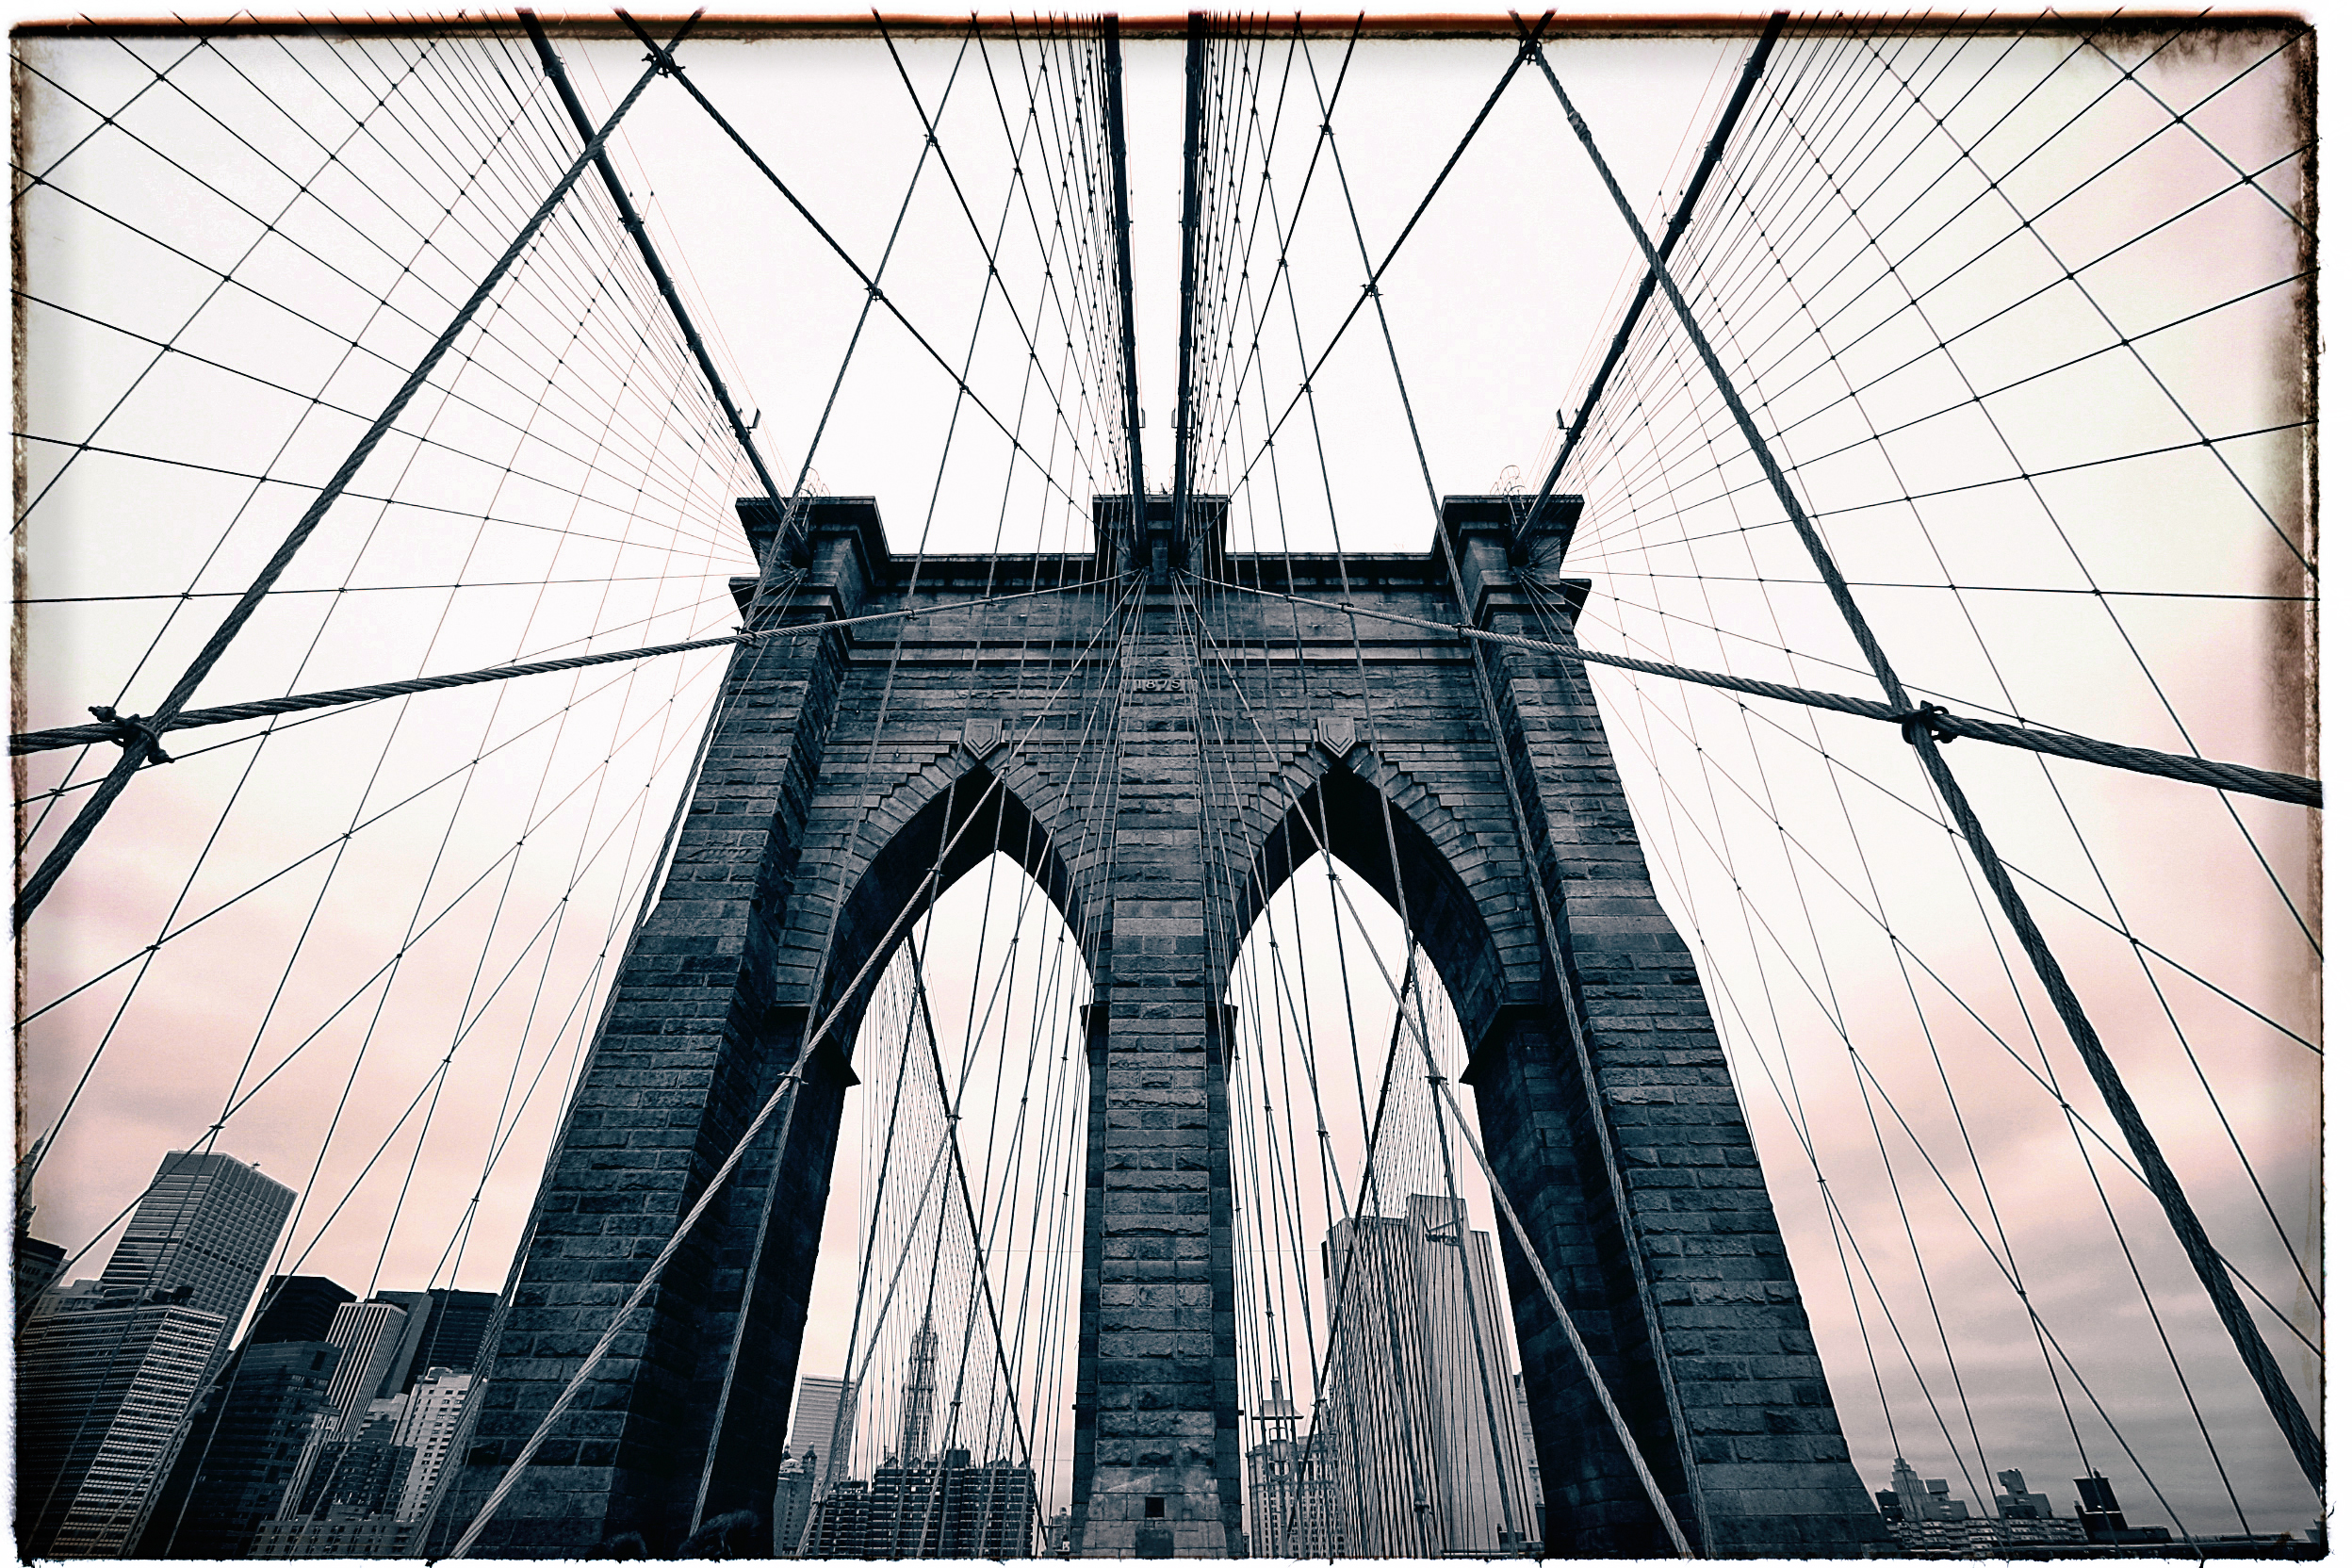 BROOKLYN BRIDGE, New York, 2005